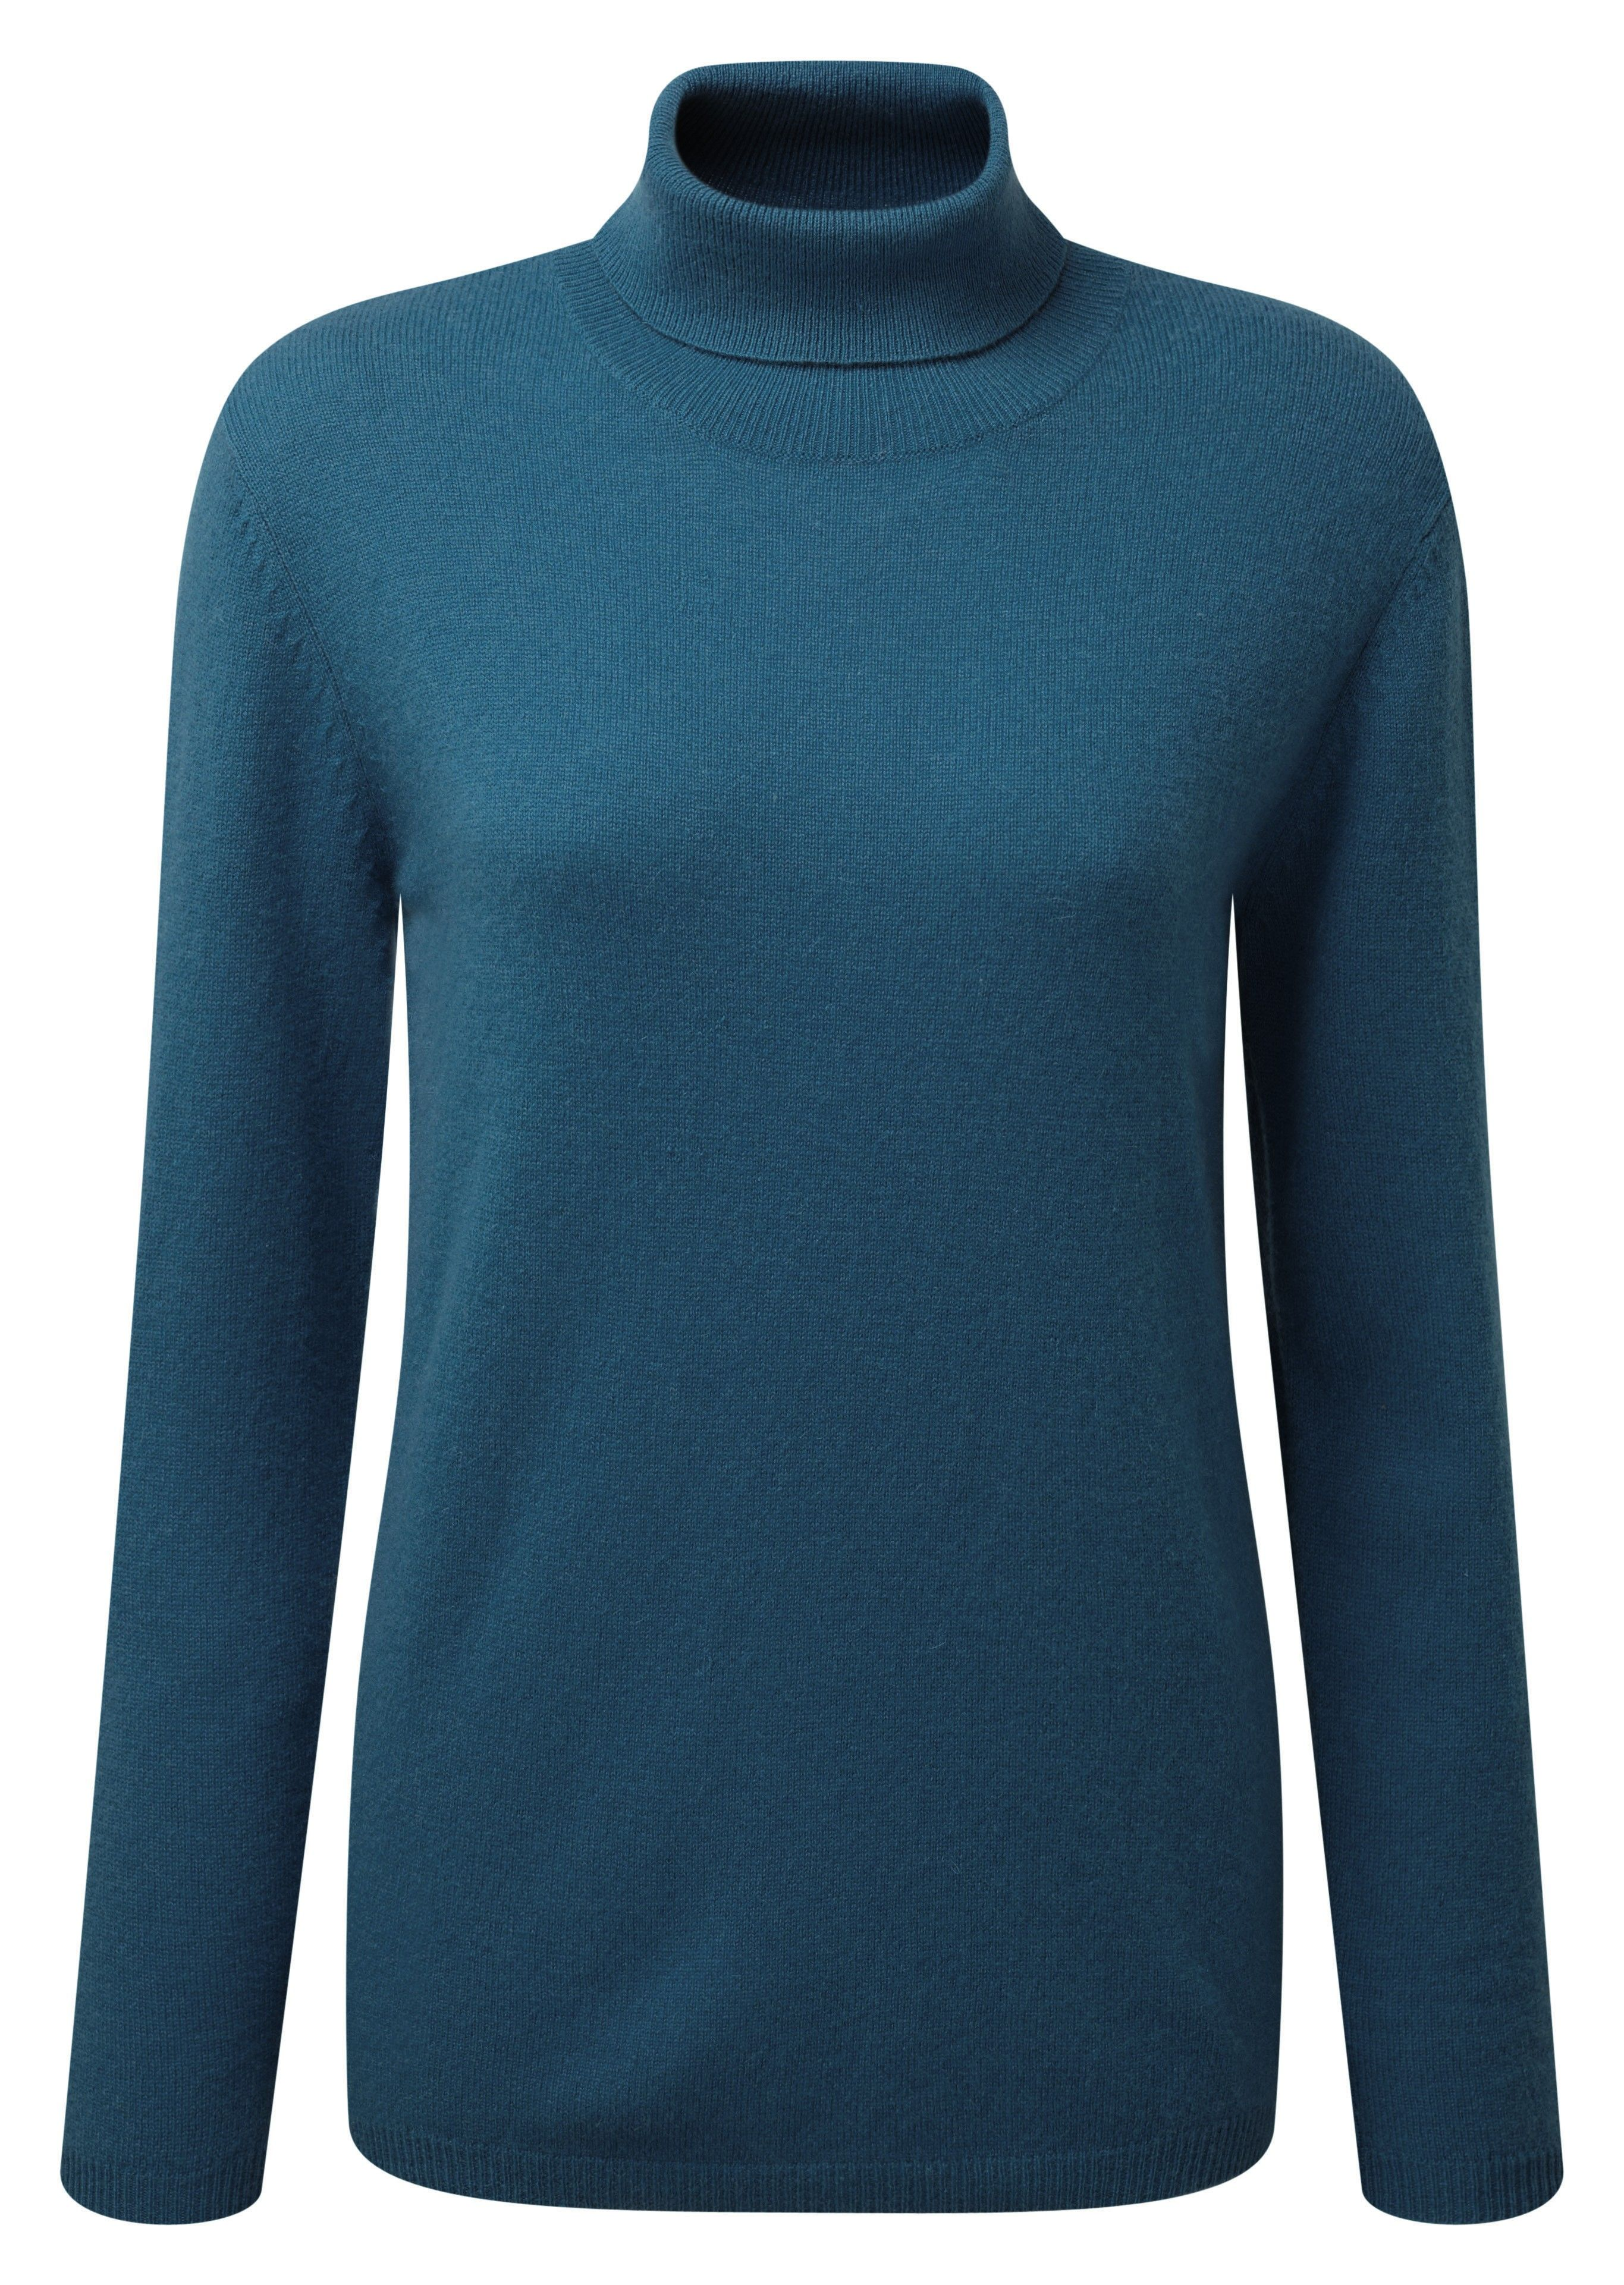 Cashmere Turtleneck Sweater Item code: T920